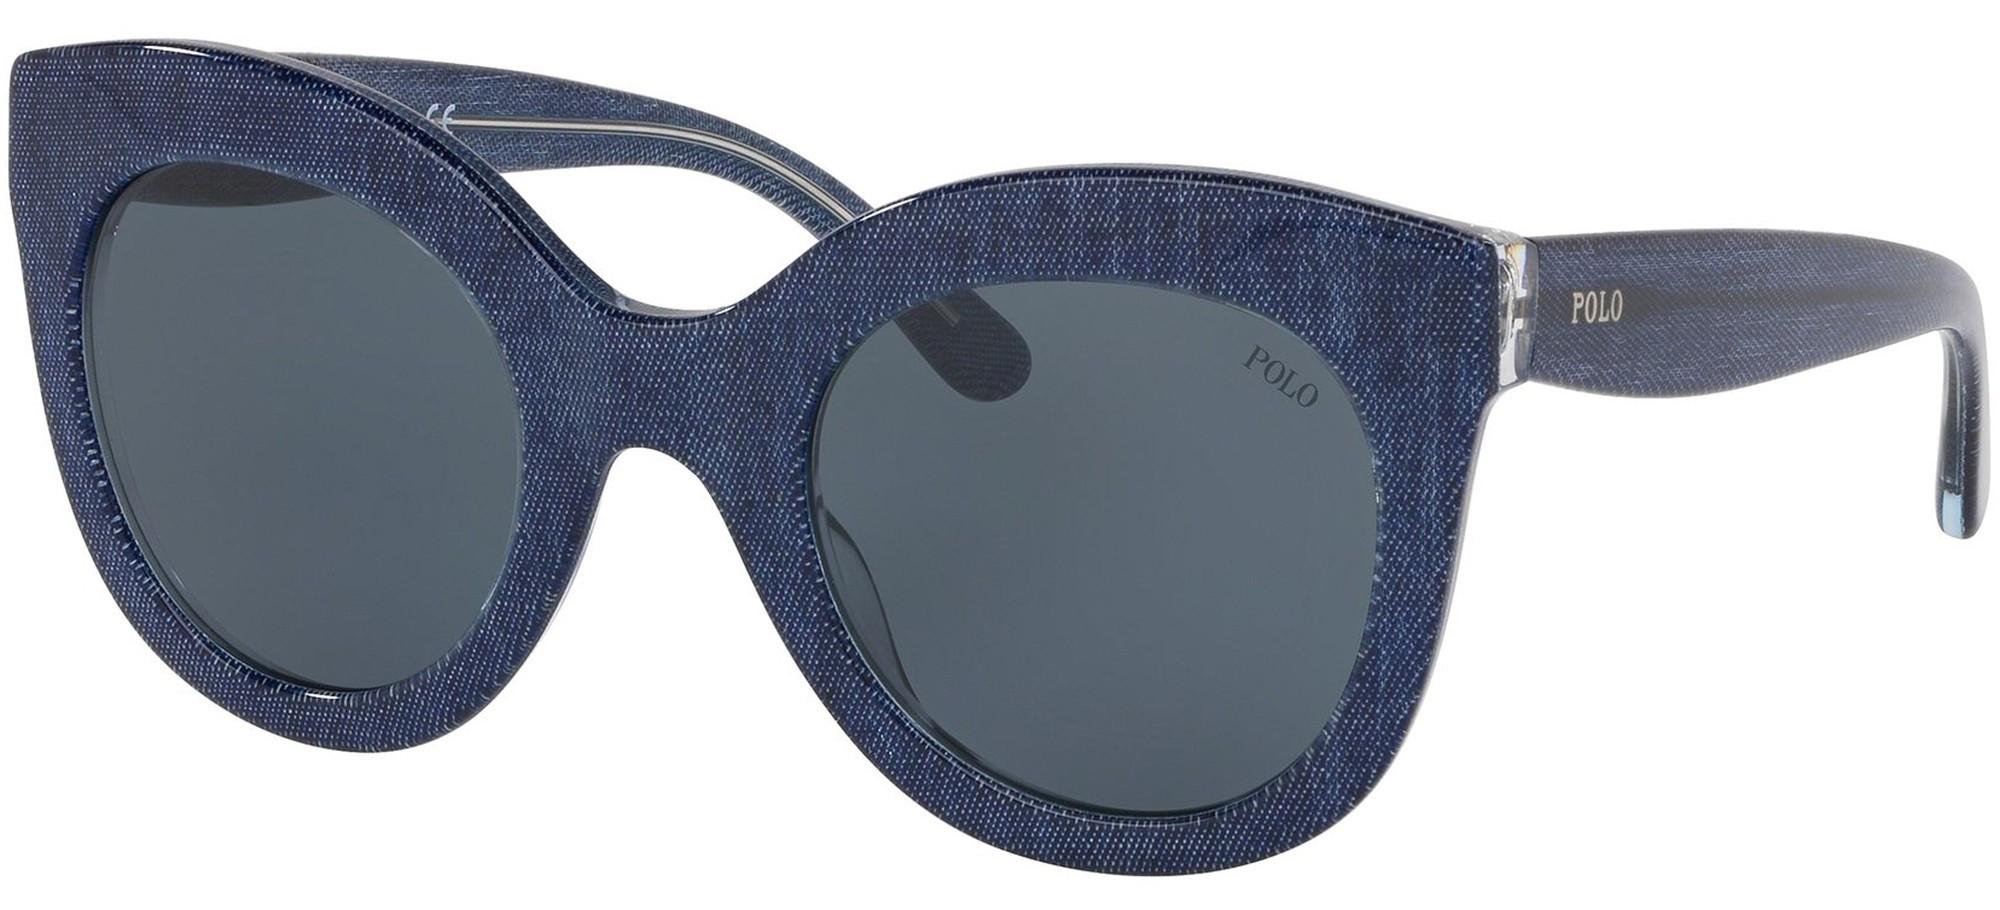 Polo Ralph Lauren zonnebrillen PH 4148